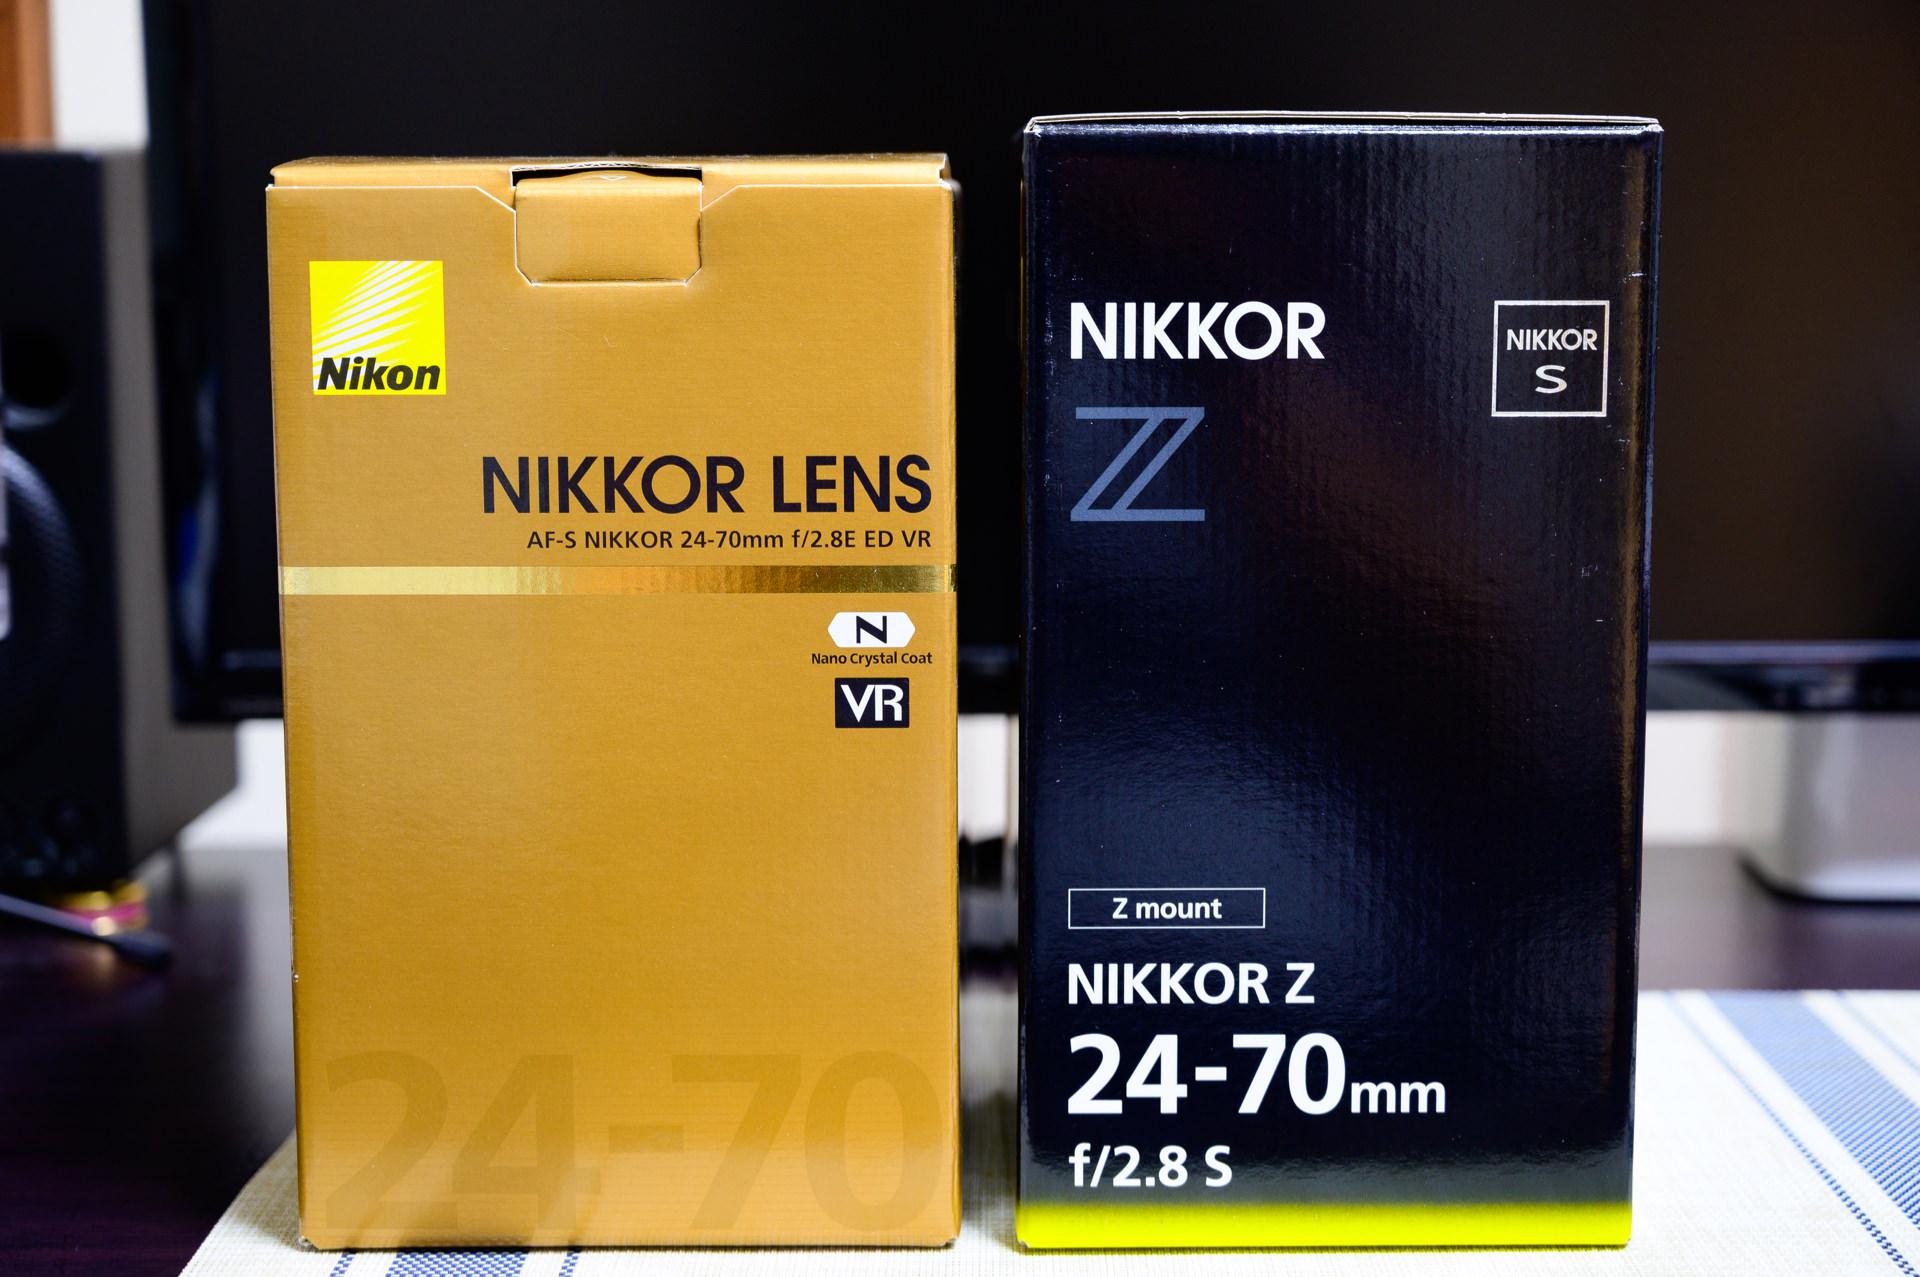 NIKKOR Z 24-70mm f/2.8 S